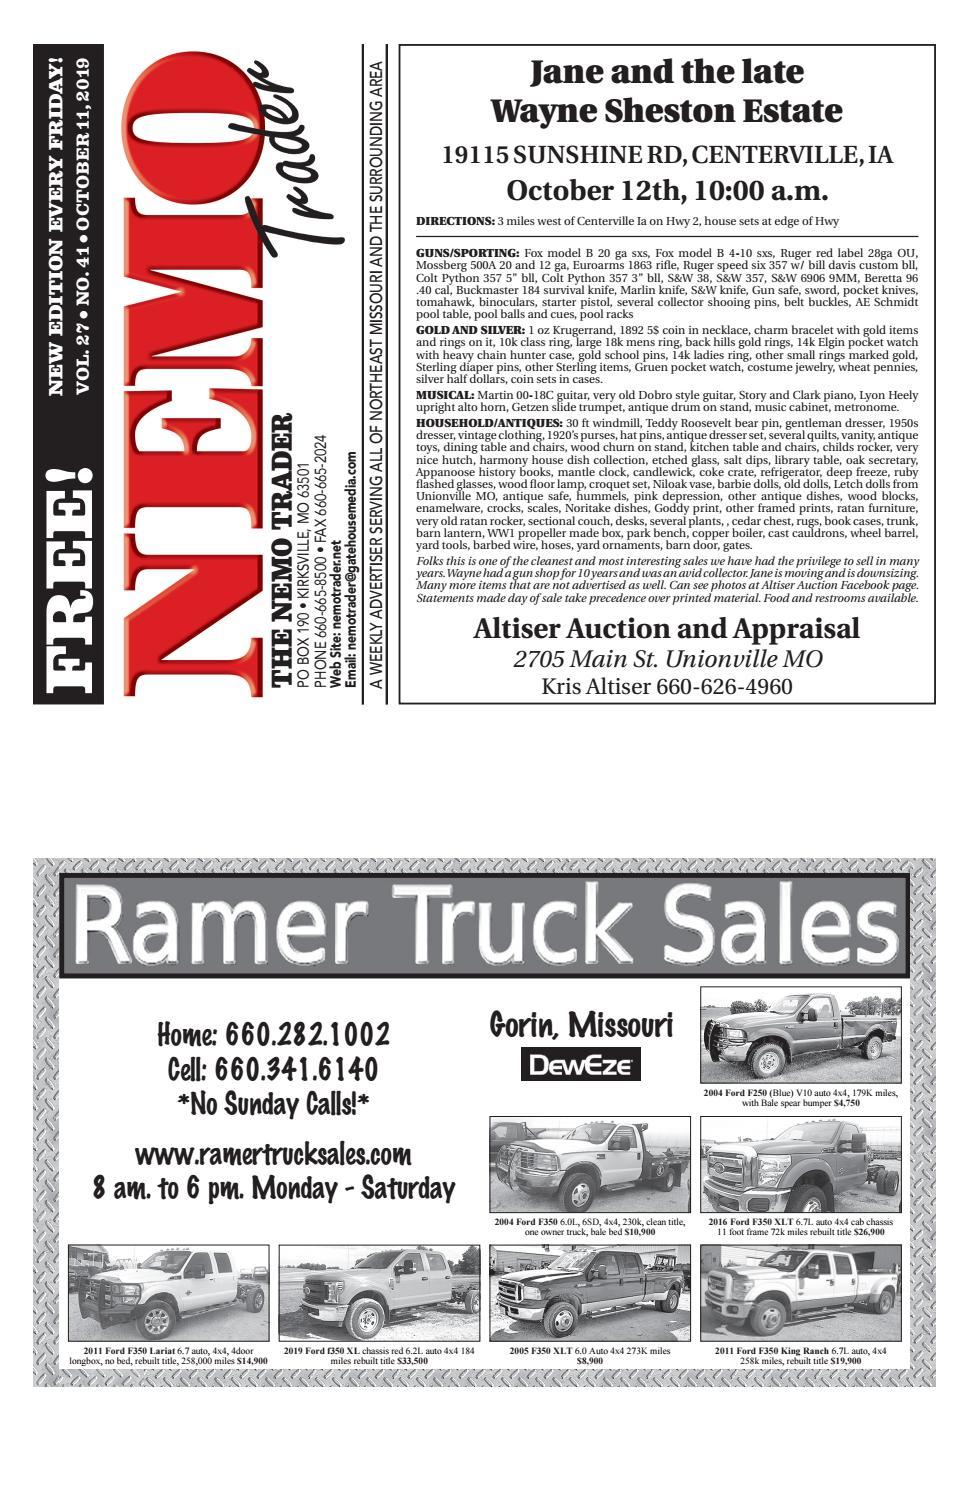 NEMO Trader October 11th, 2019 by NEMO Trader - issuu